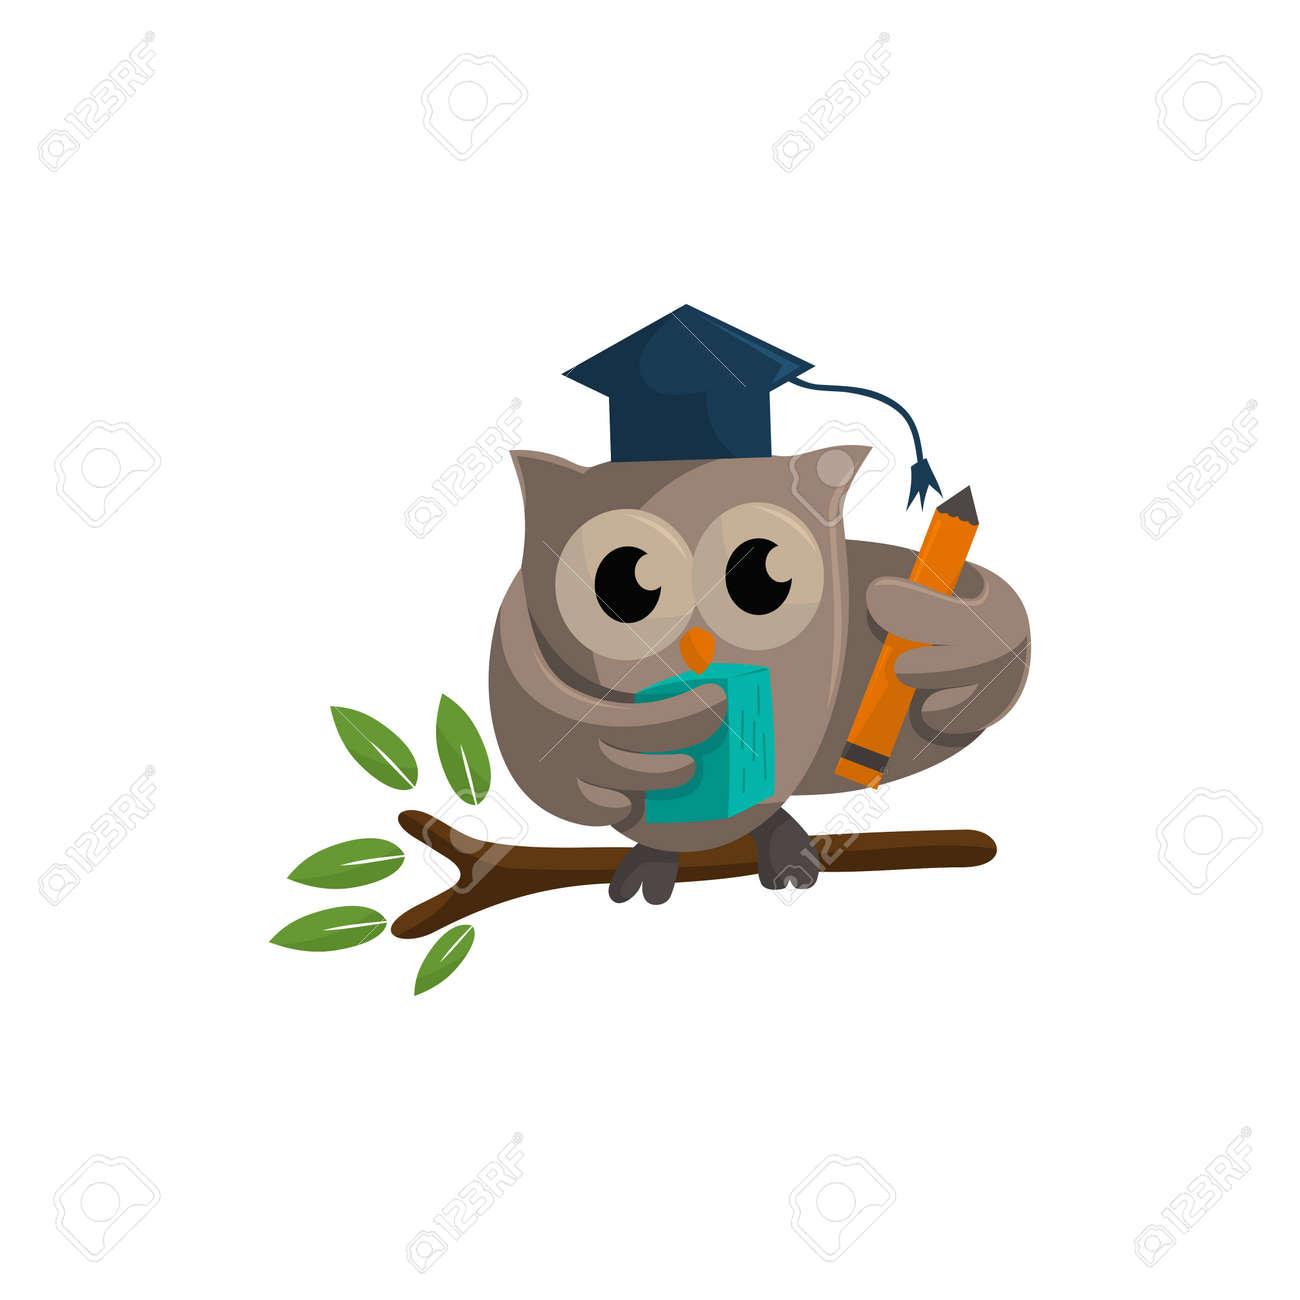 Owl bird template design Smart Education with Owl Symbol - 166860426